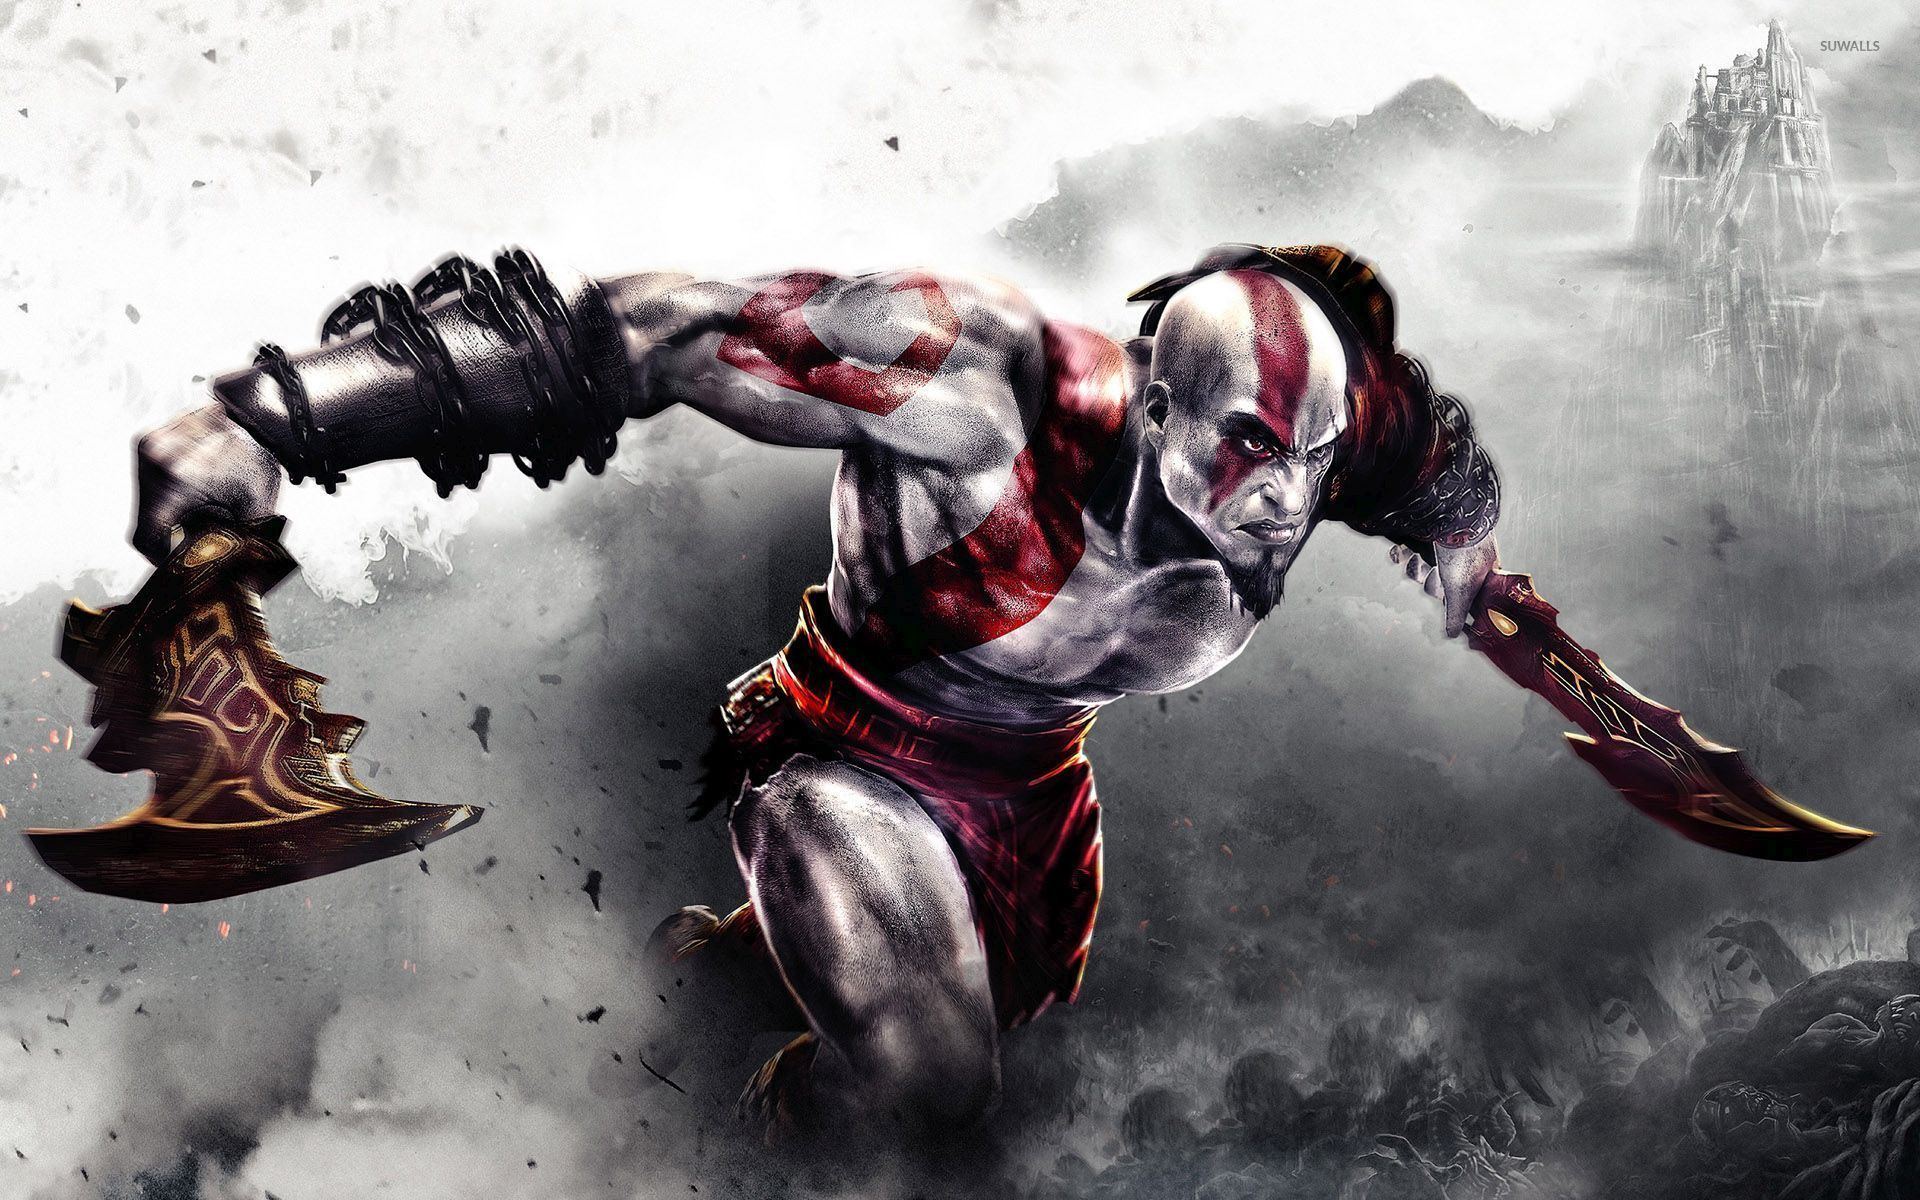 fighting kratos in god of war wallpaper game wallpapers